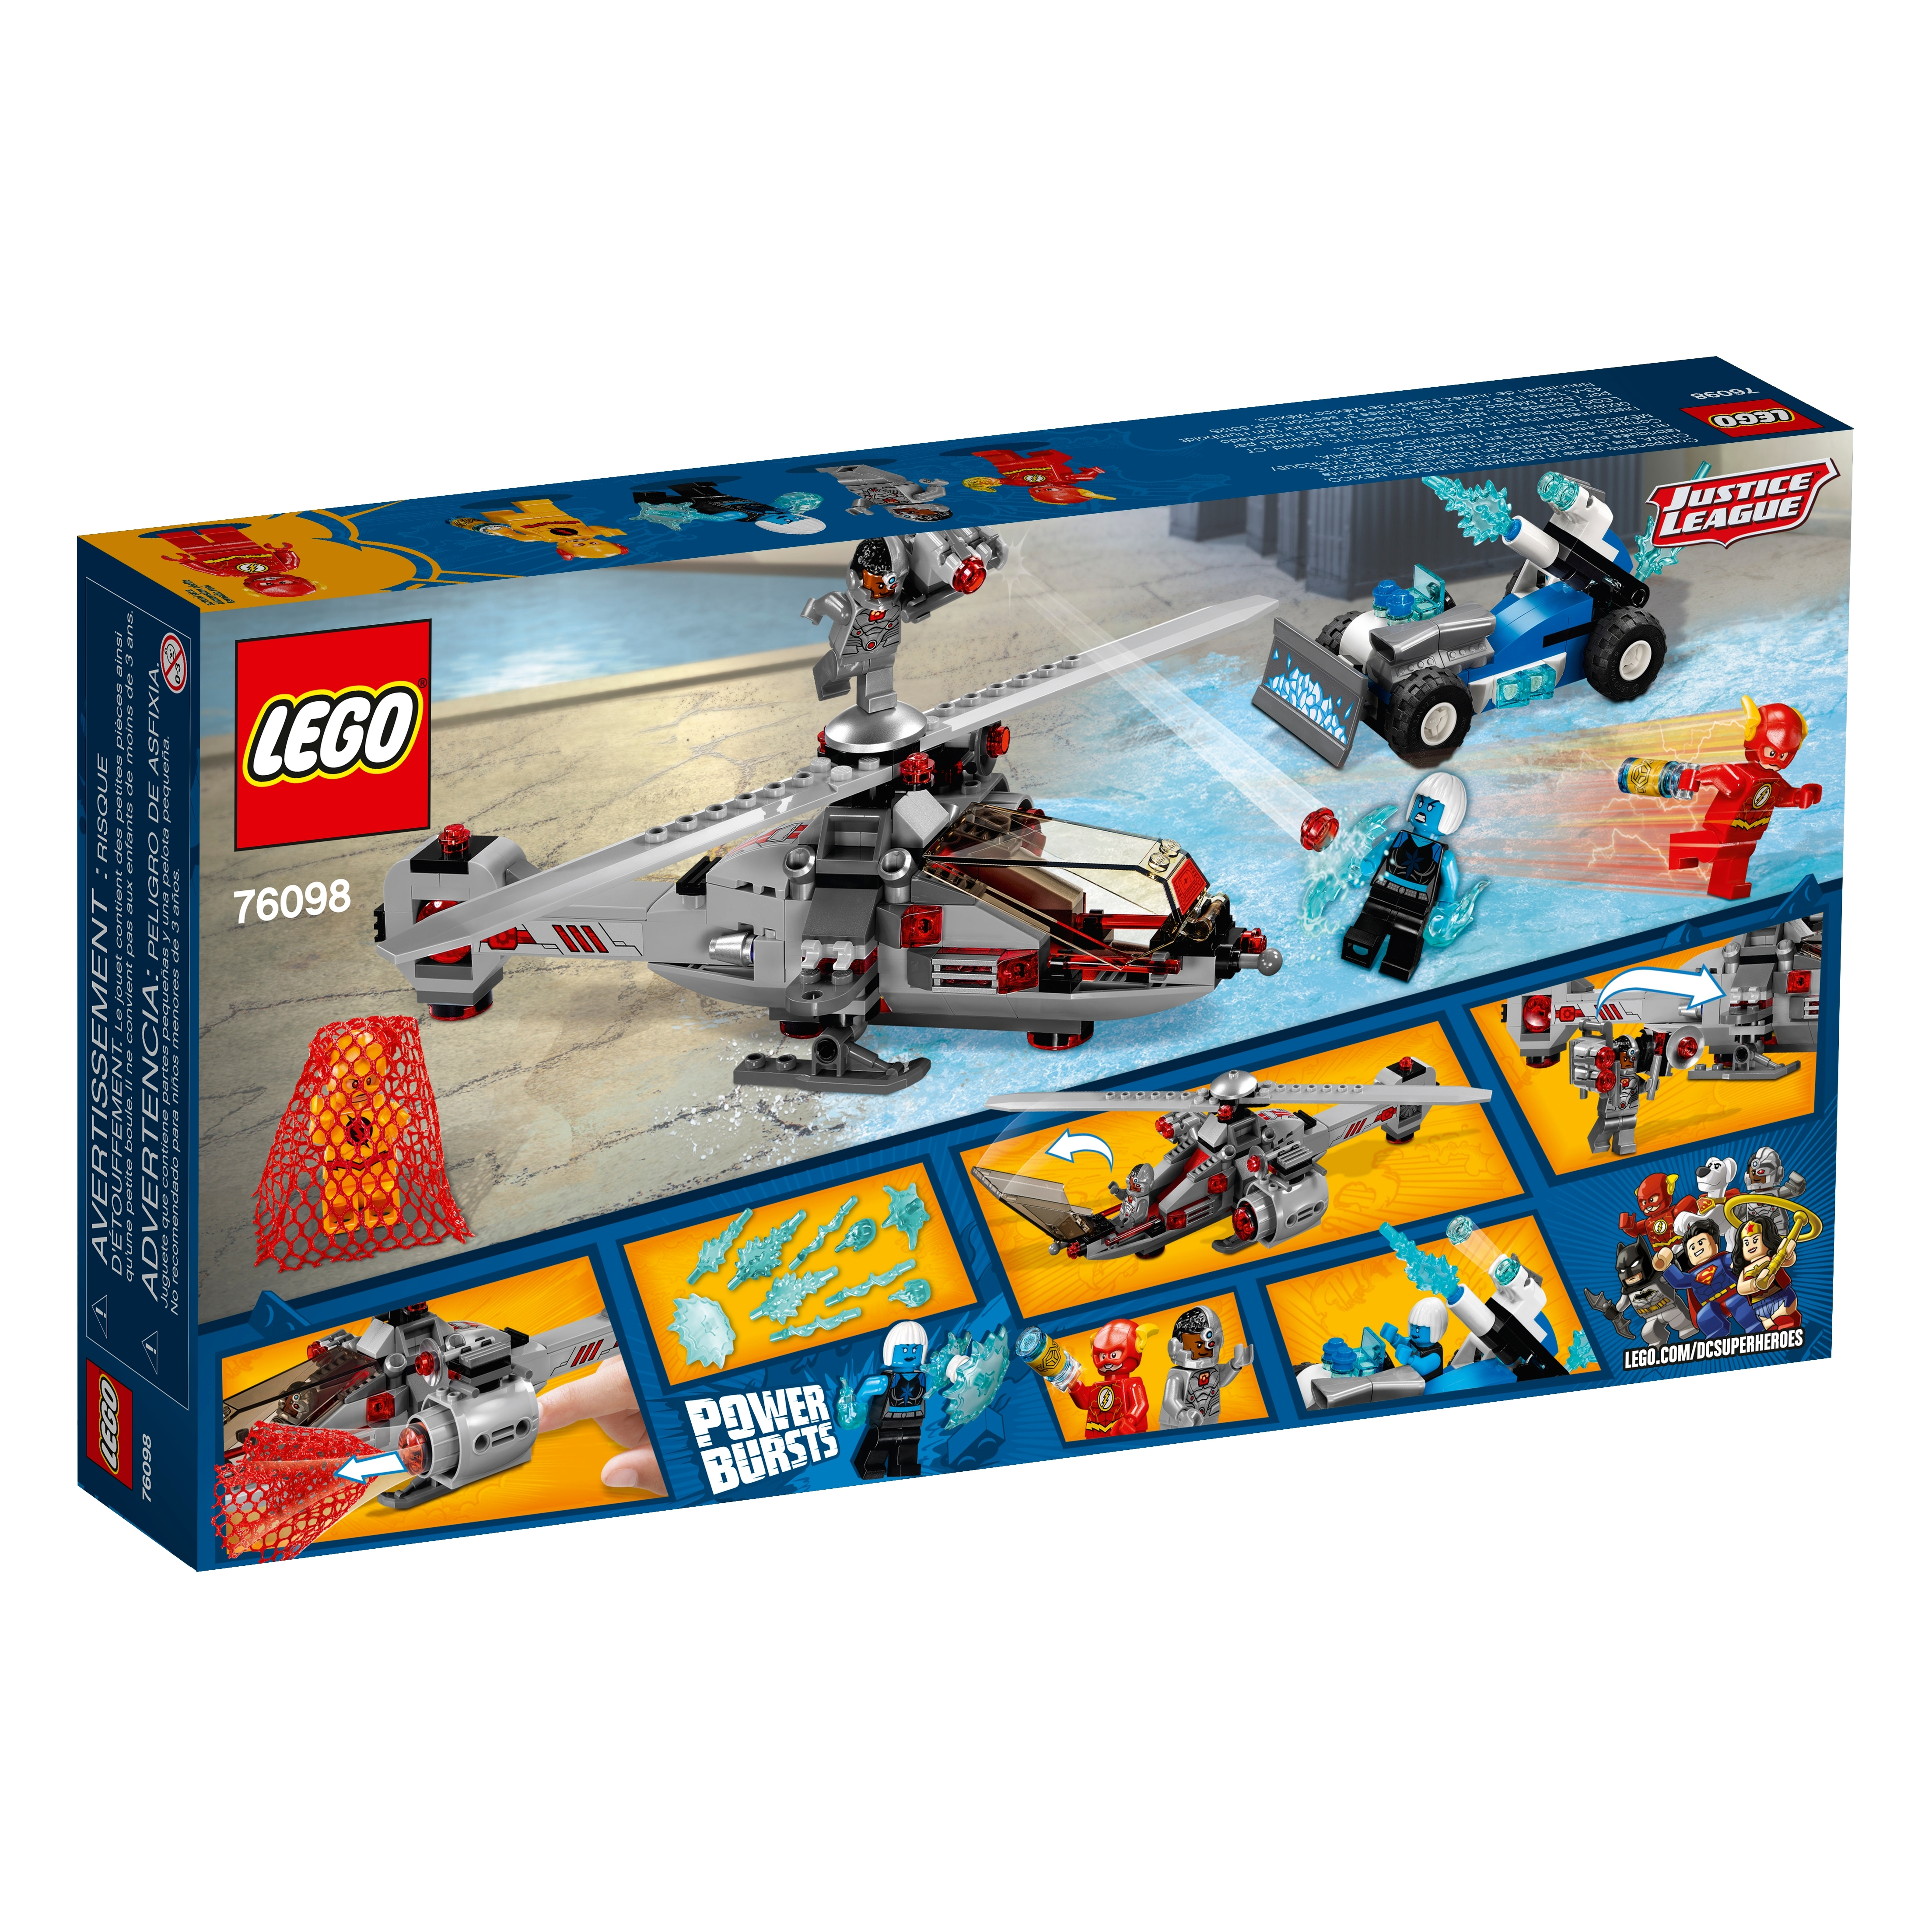 LEGO PART STICKER FOR SET 76098 SPEED FORCE FREEZE PURSUIT SUPER HEROES